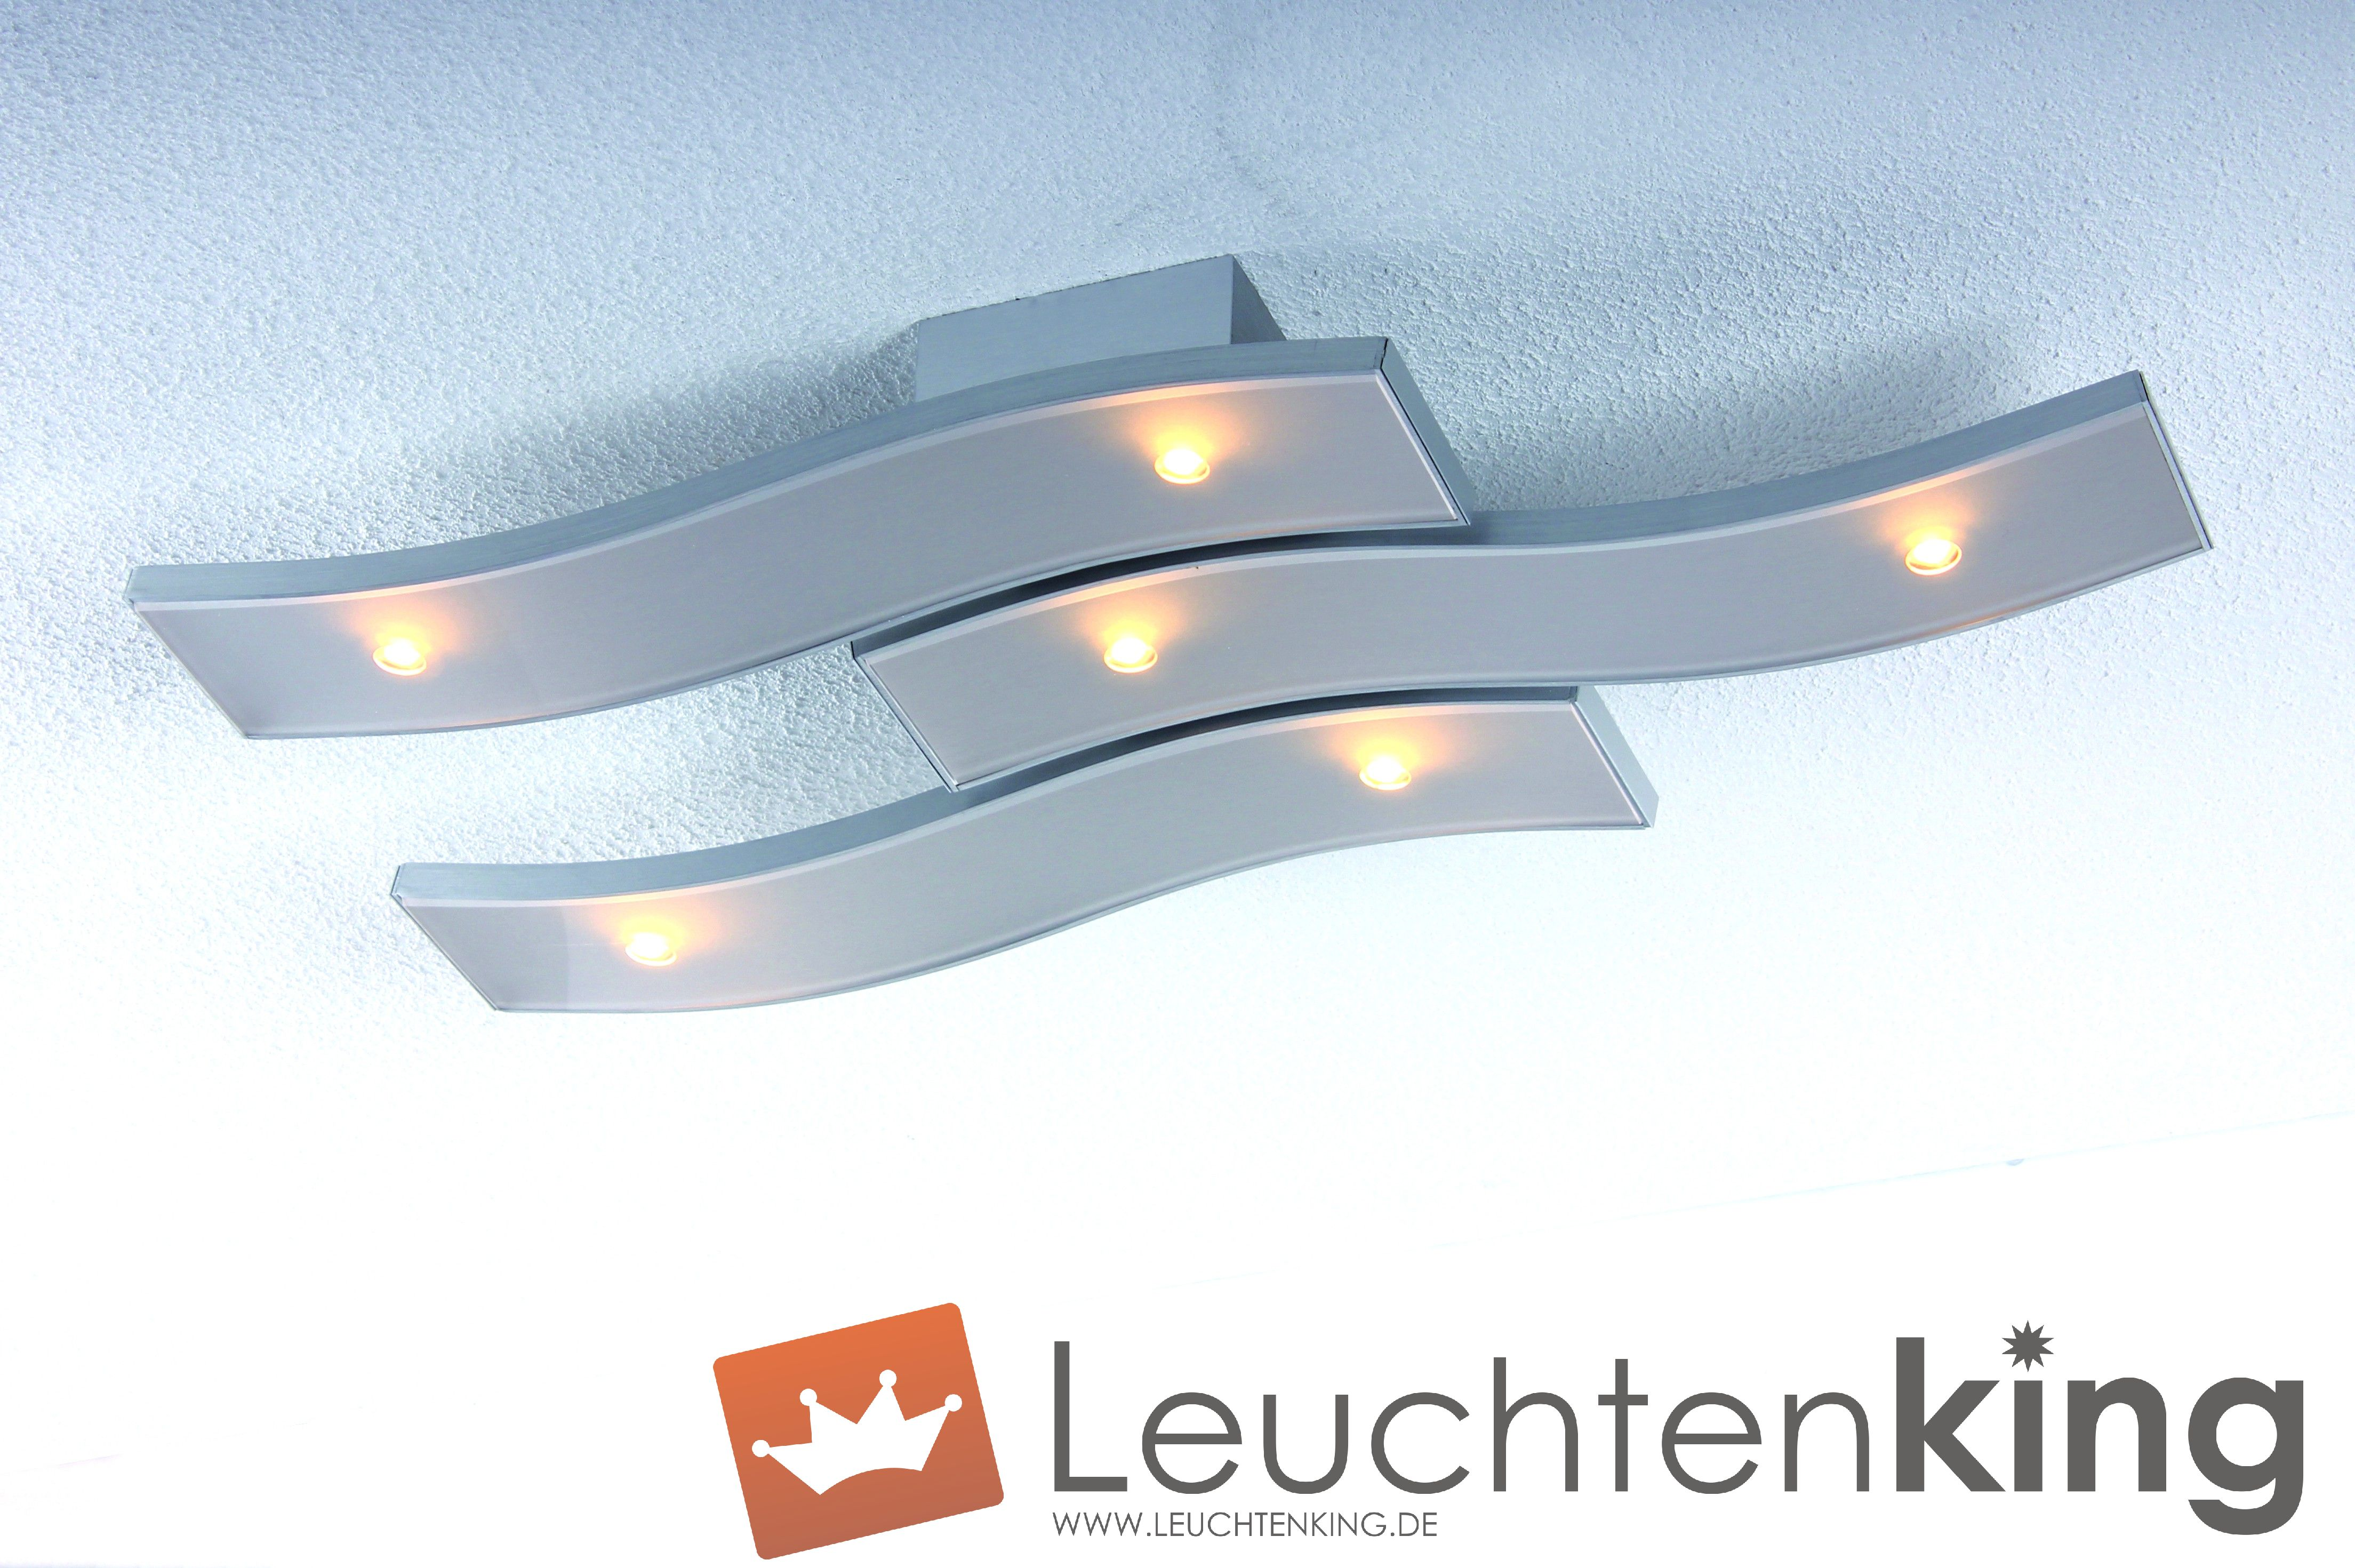 bopp onda led deckenleuchte 6 flammig dimmbar 32280609. Black Bedroom Furniture Sets. Home Design Ideas